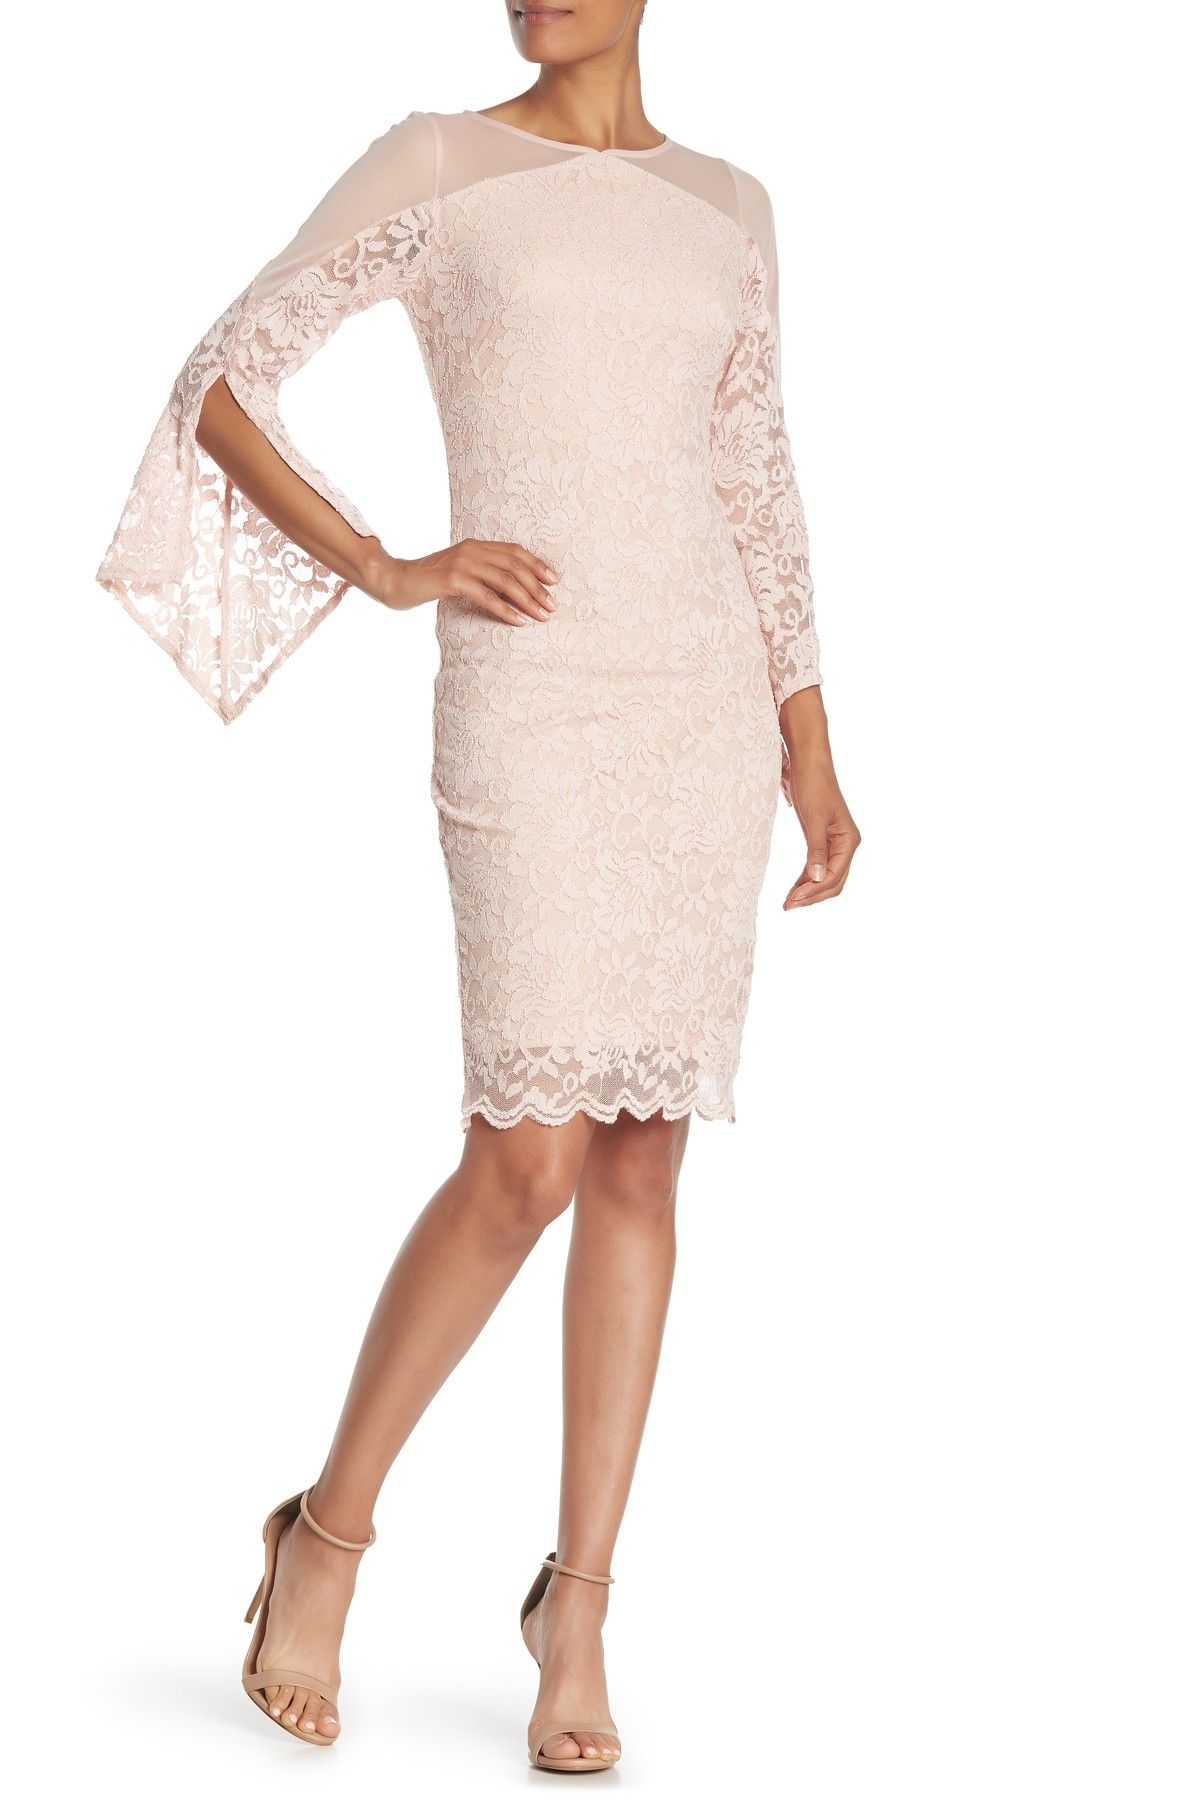 Marina Lace Mesh Panel Midi Dress Nordstrom Rack Midi Dress Dresses Nordstrom Dresses [ 1800 x 1200 Pixel ]